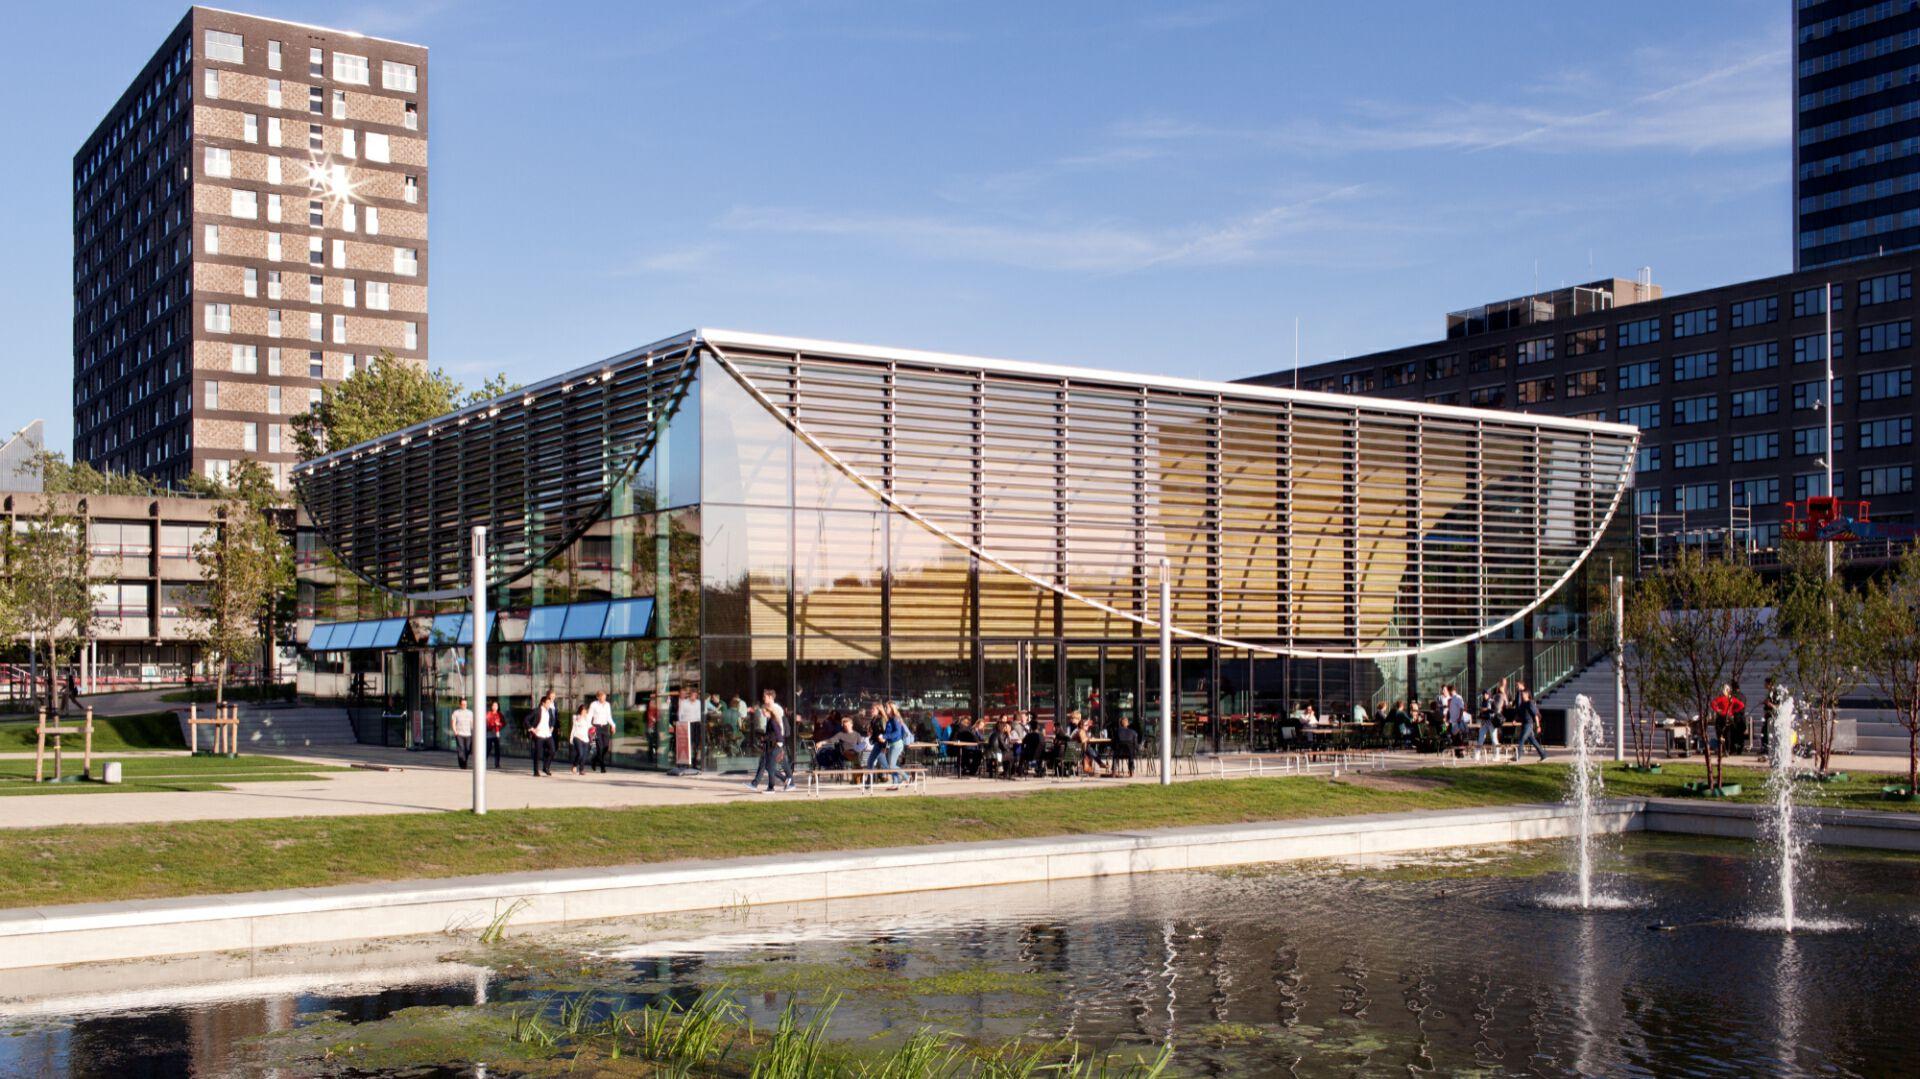 Pawilon studencki_Uniwersytet Erazma_fot. Christian van der Kooy (2).jpg